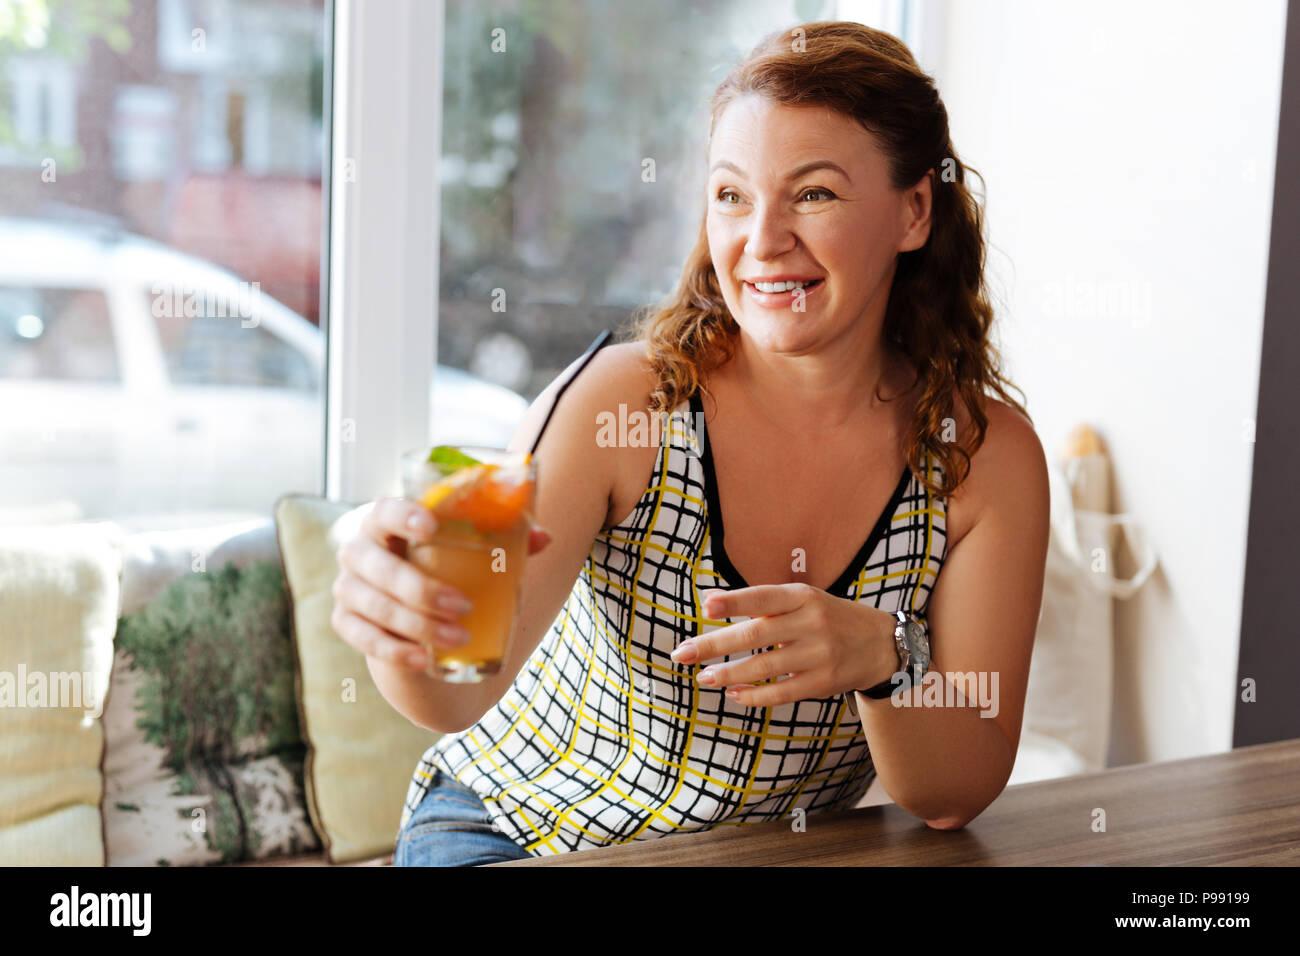 Rothaarige strahlende Frau trinkt Cocktail im Restaurant Stockfoto